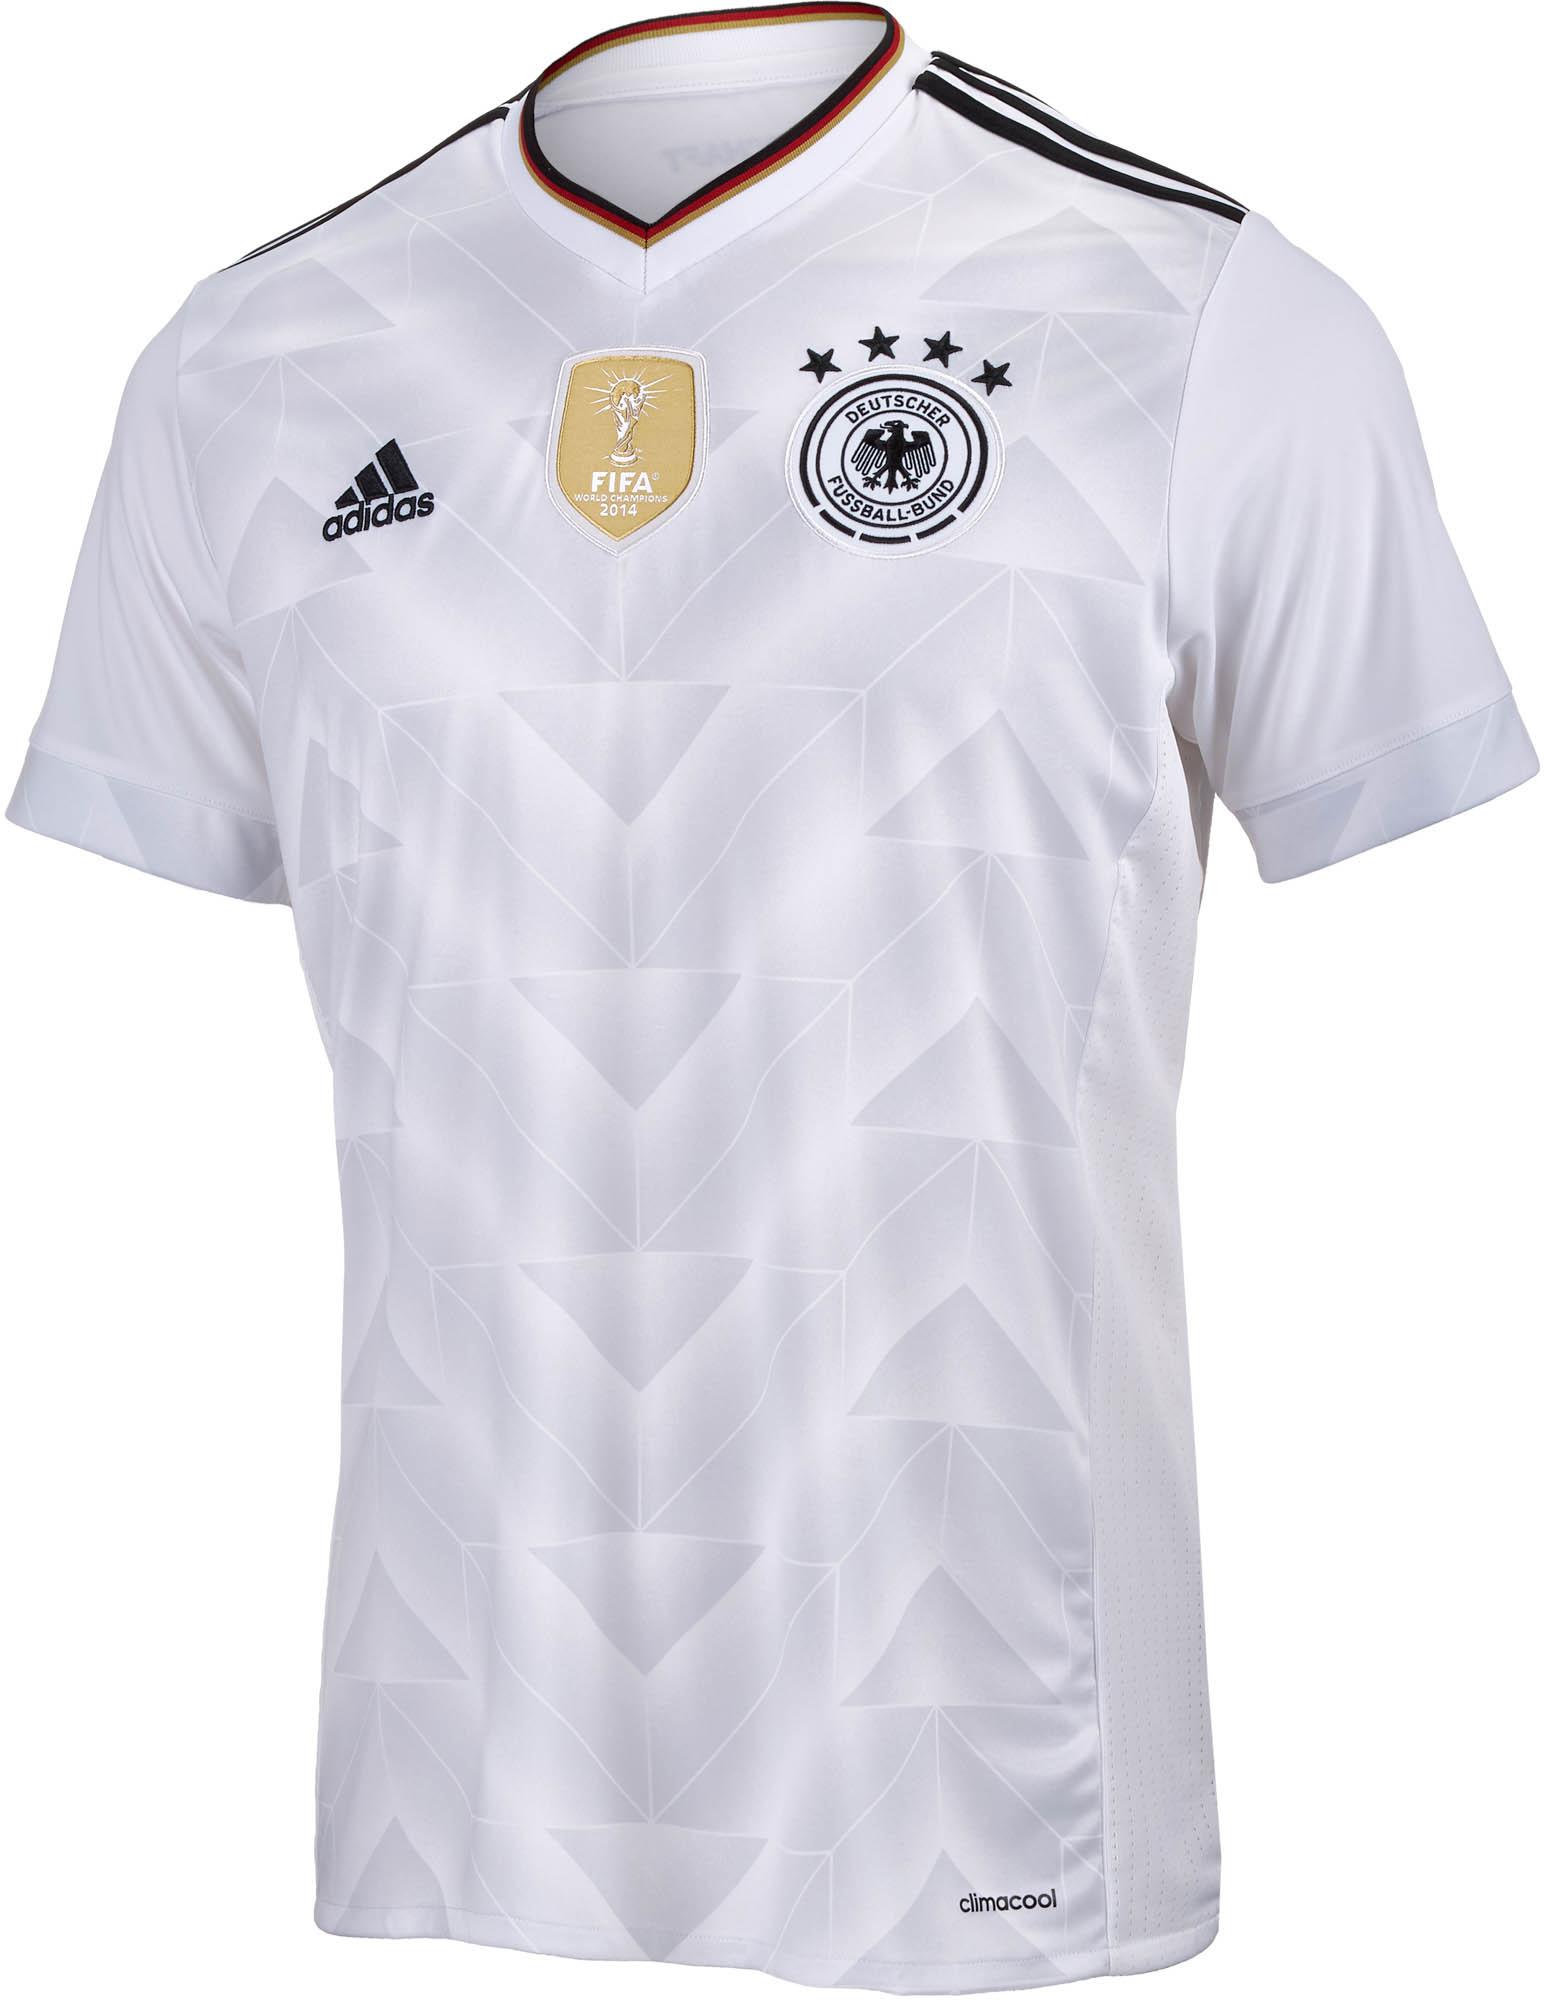 adidas 2017/18 Germany Home Jersey - adidas Soccer Jerseys